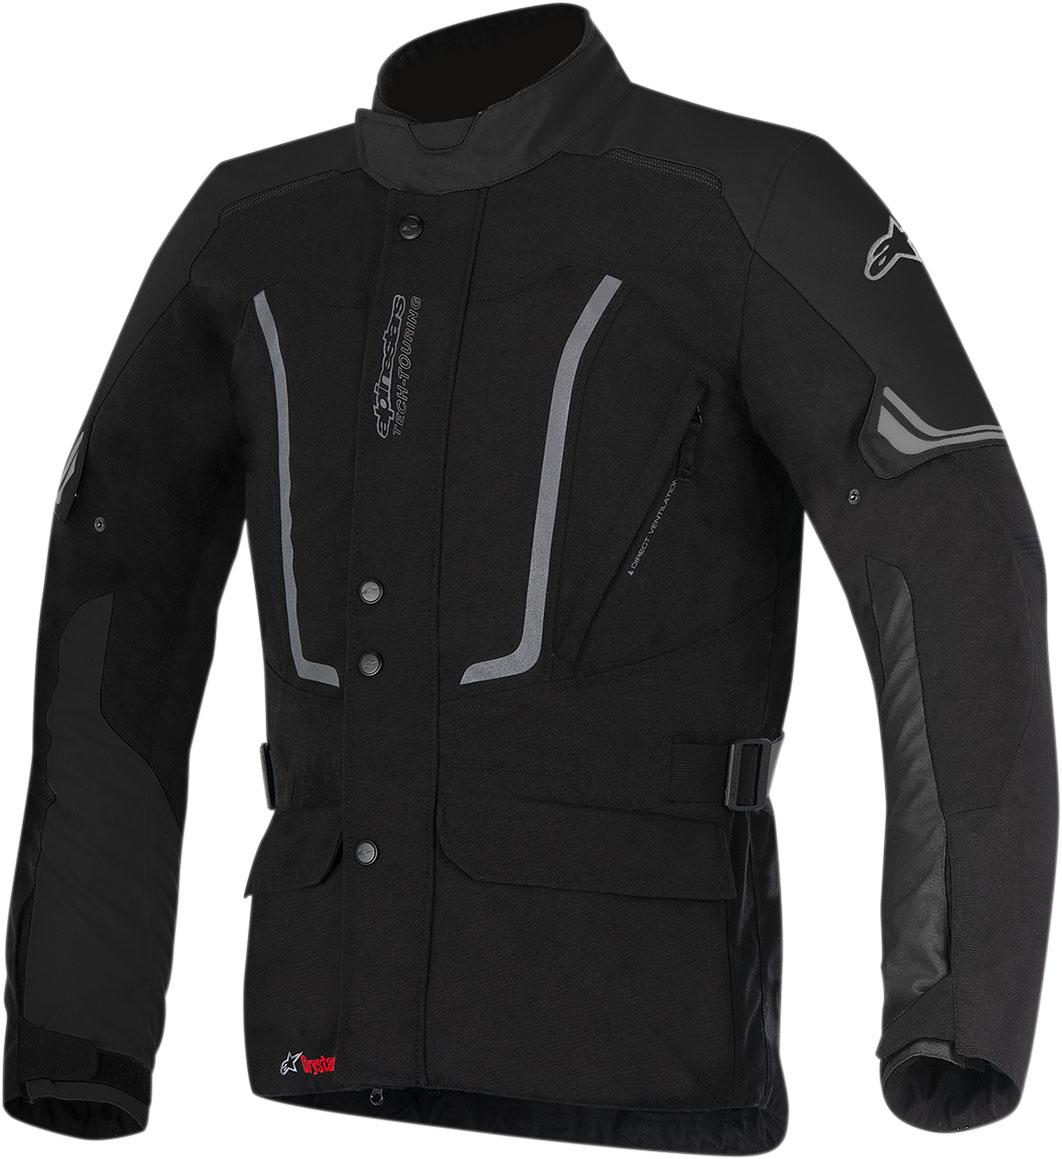 Alpinestars VENCE Drystar Adventure-Touring Jacket (Black)